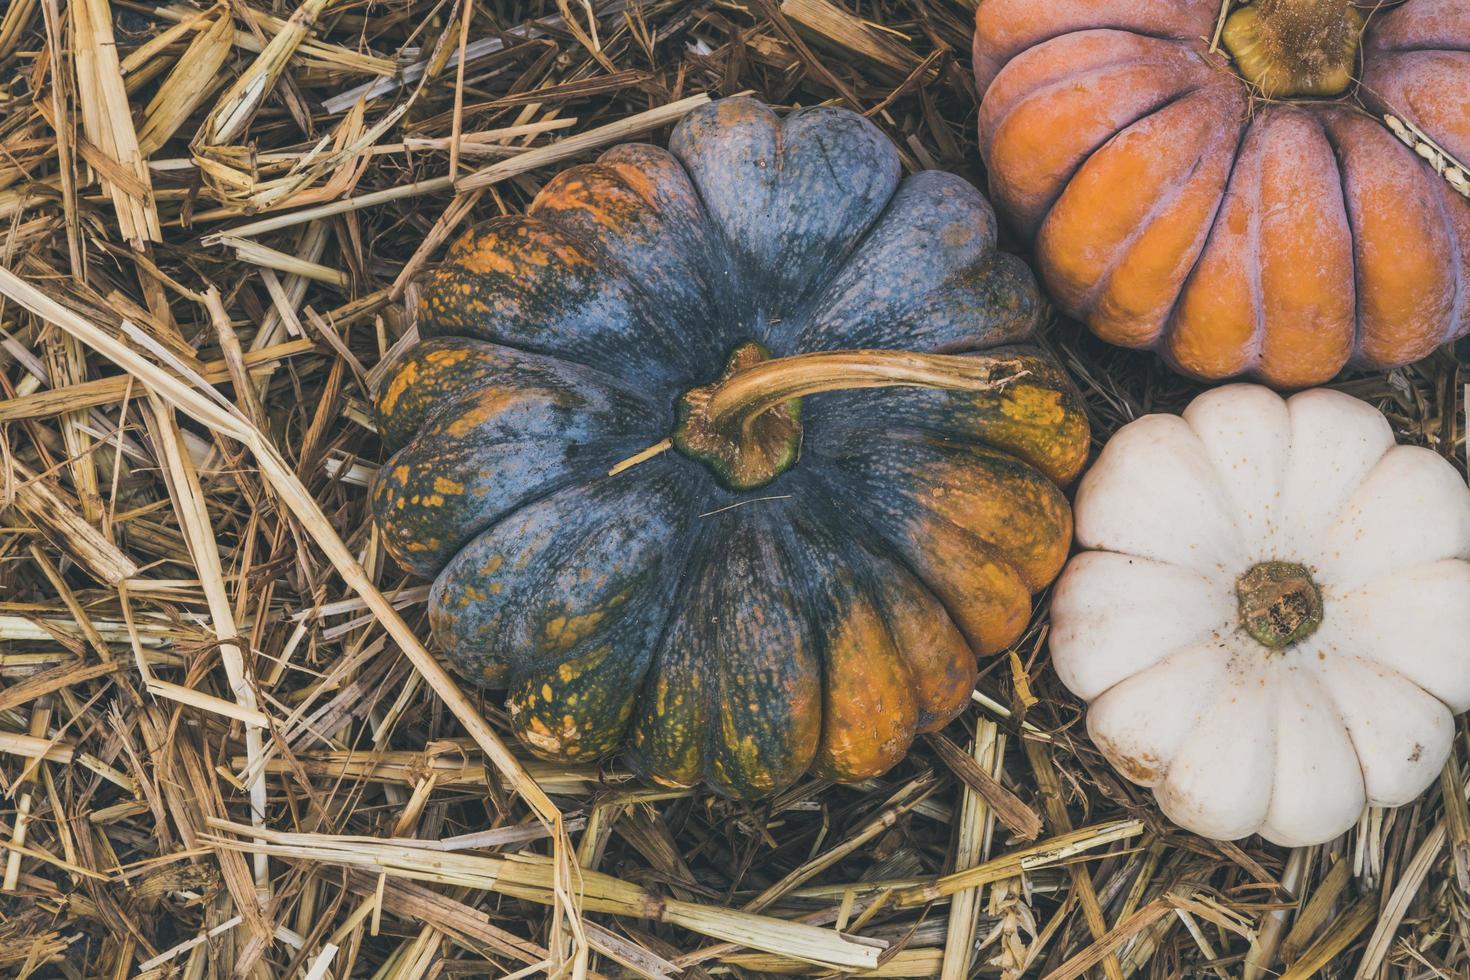 Pumpkins on hay photo